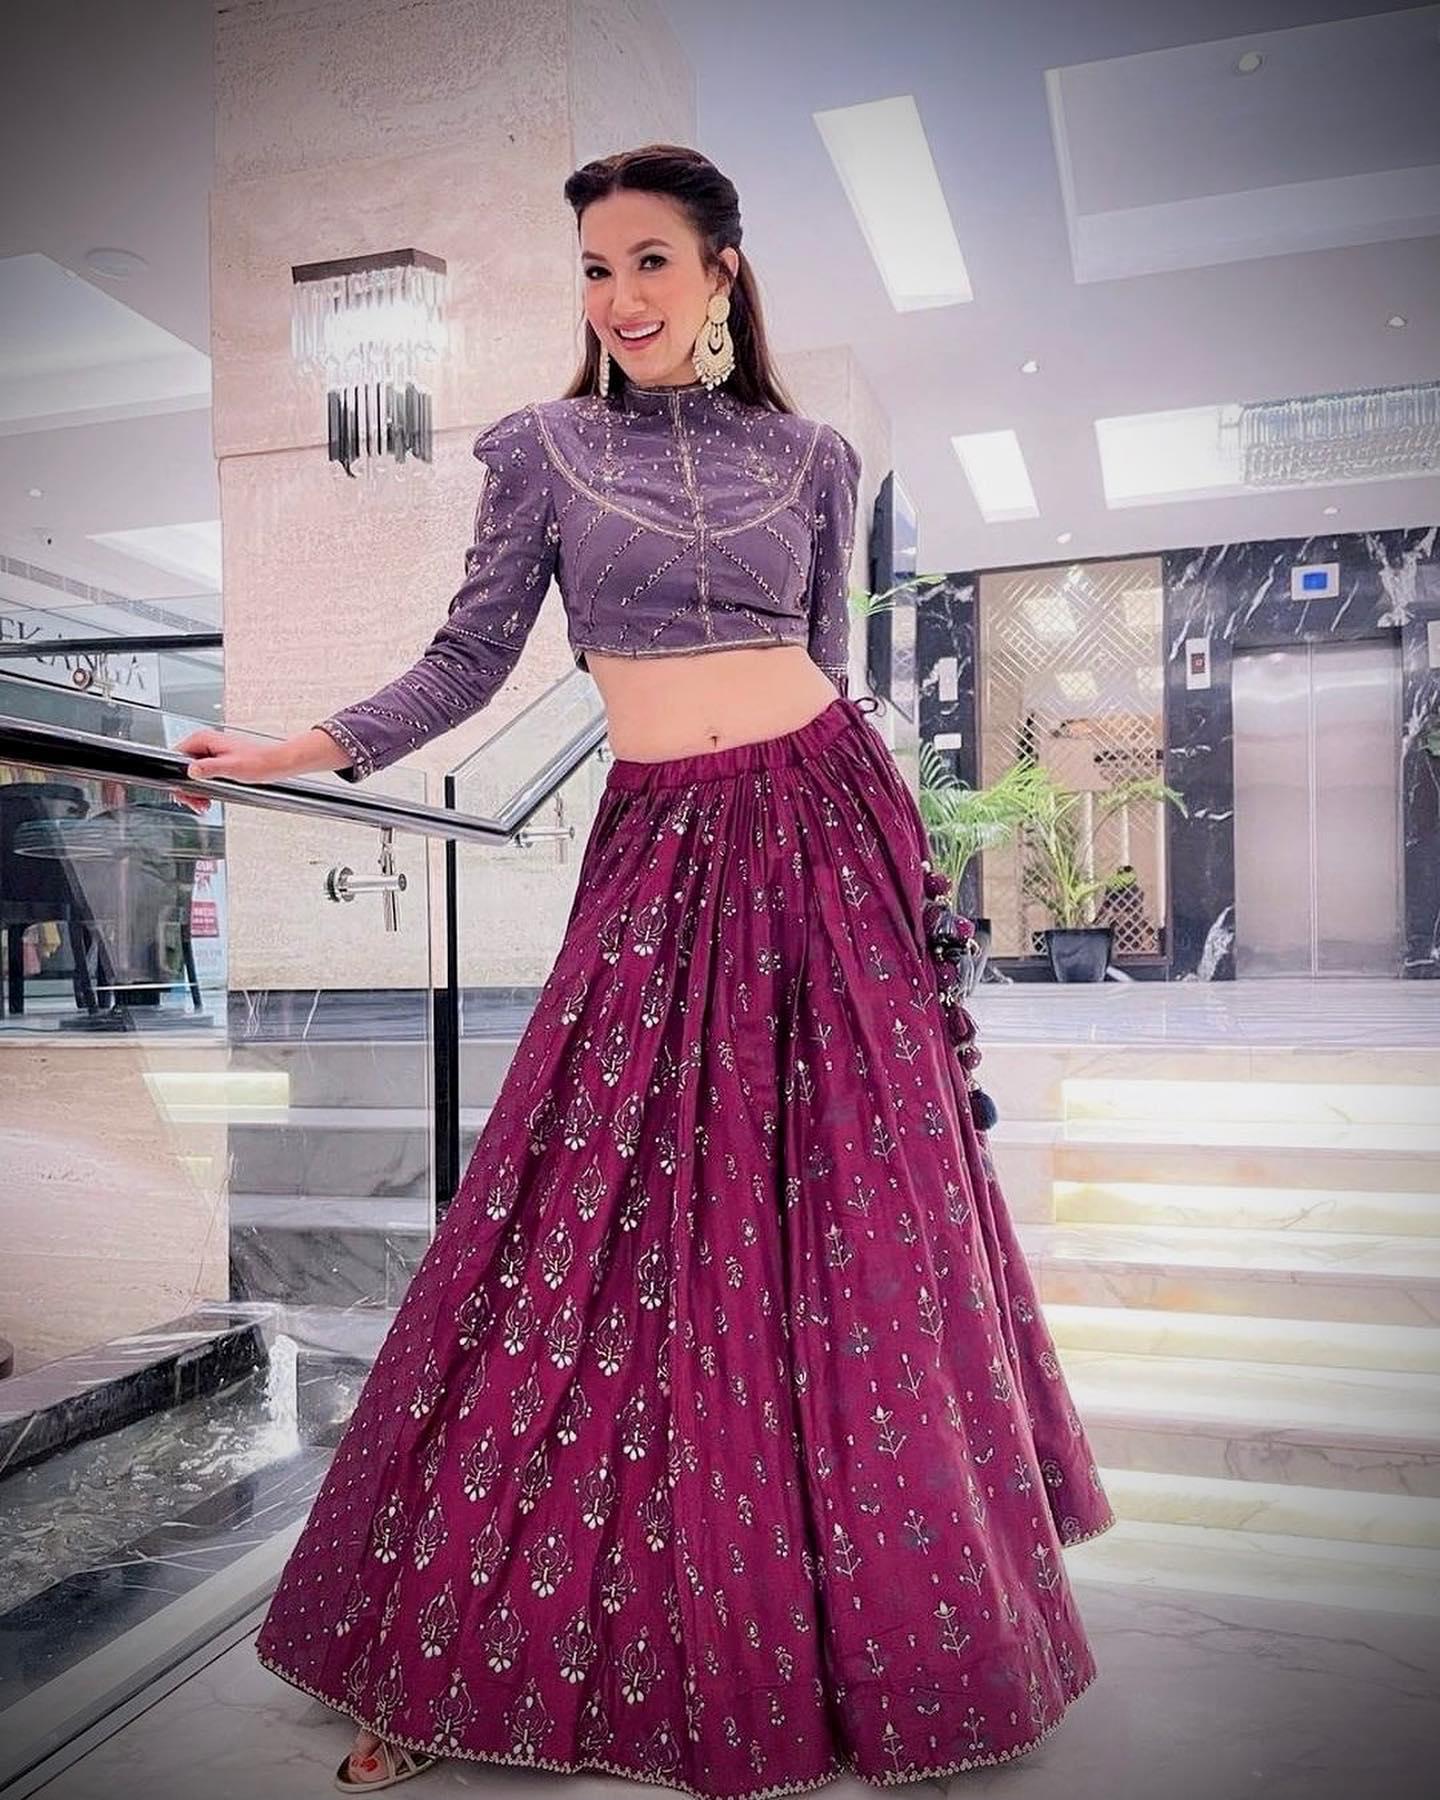 Tandav actor Gauahar Kha aces sophistication and undeniable edge in wine lehenga, blouse